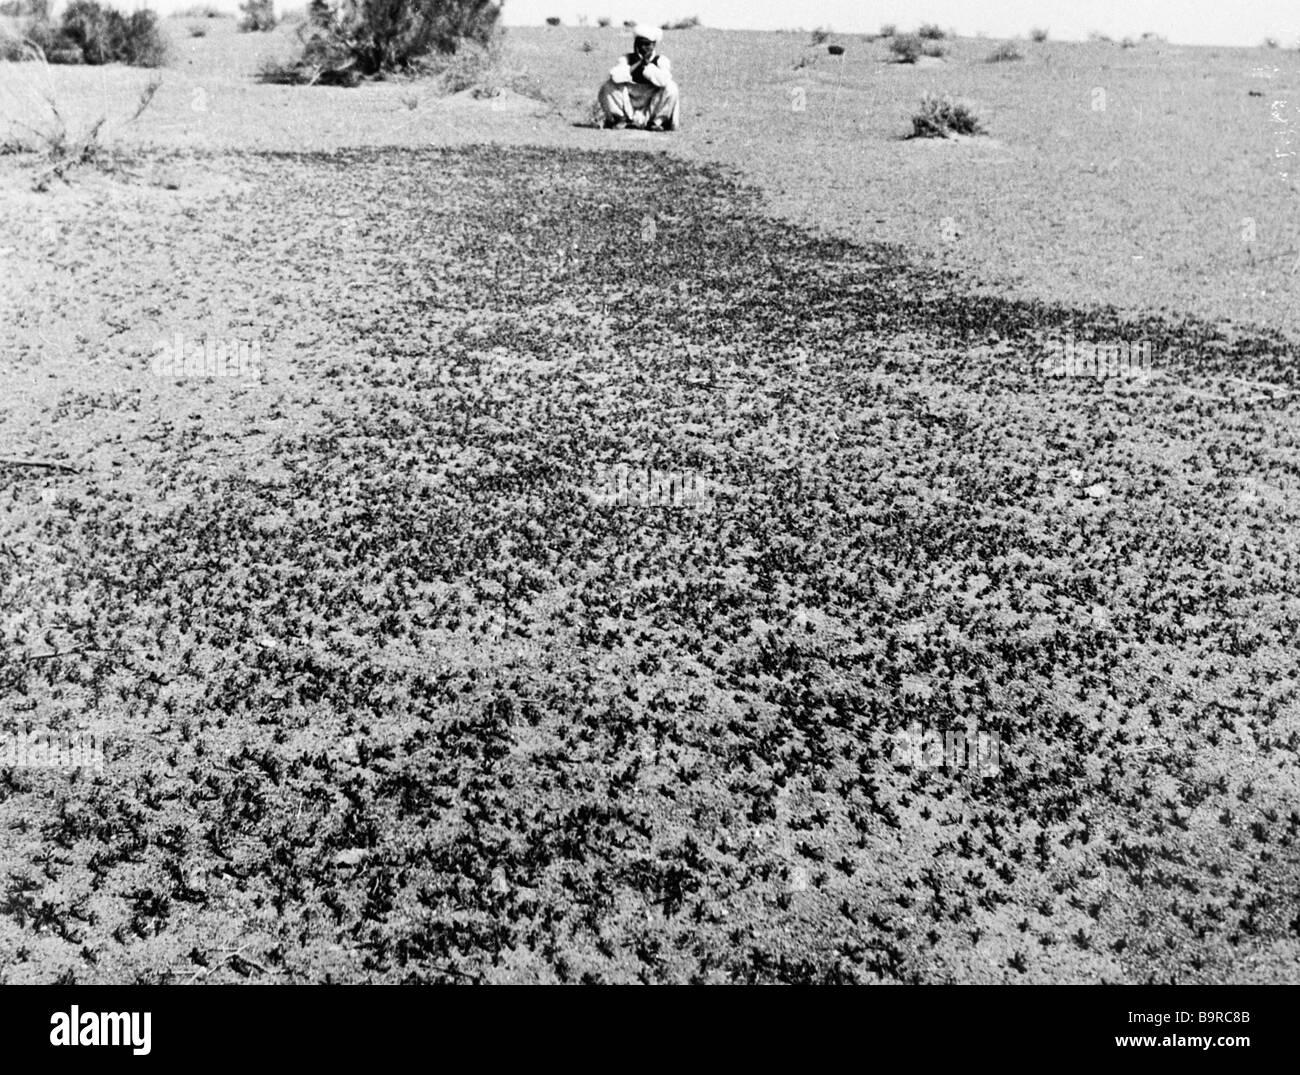 Peasant watches locust swarm - Stock Image